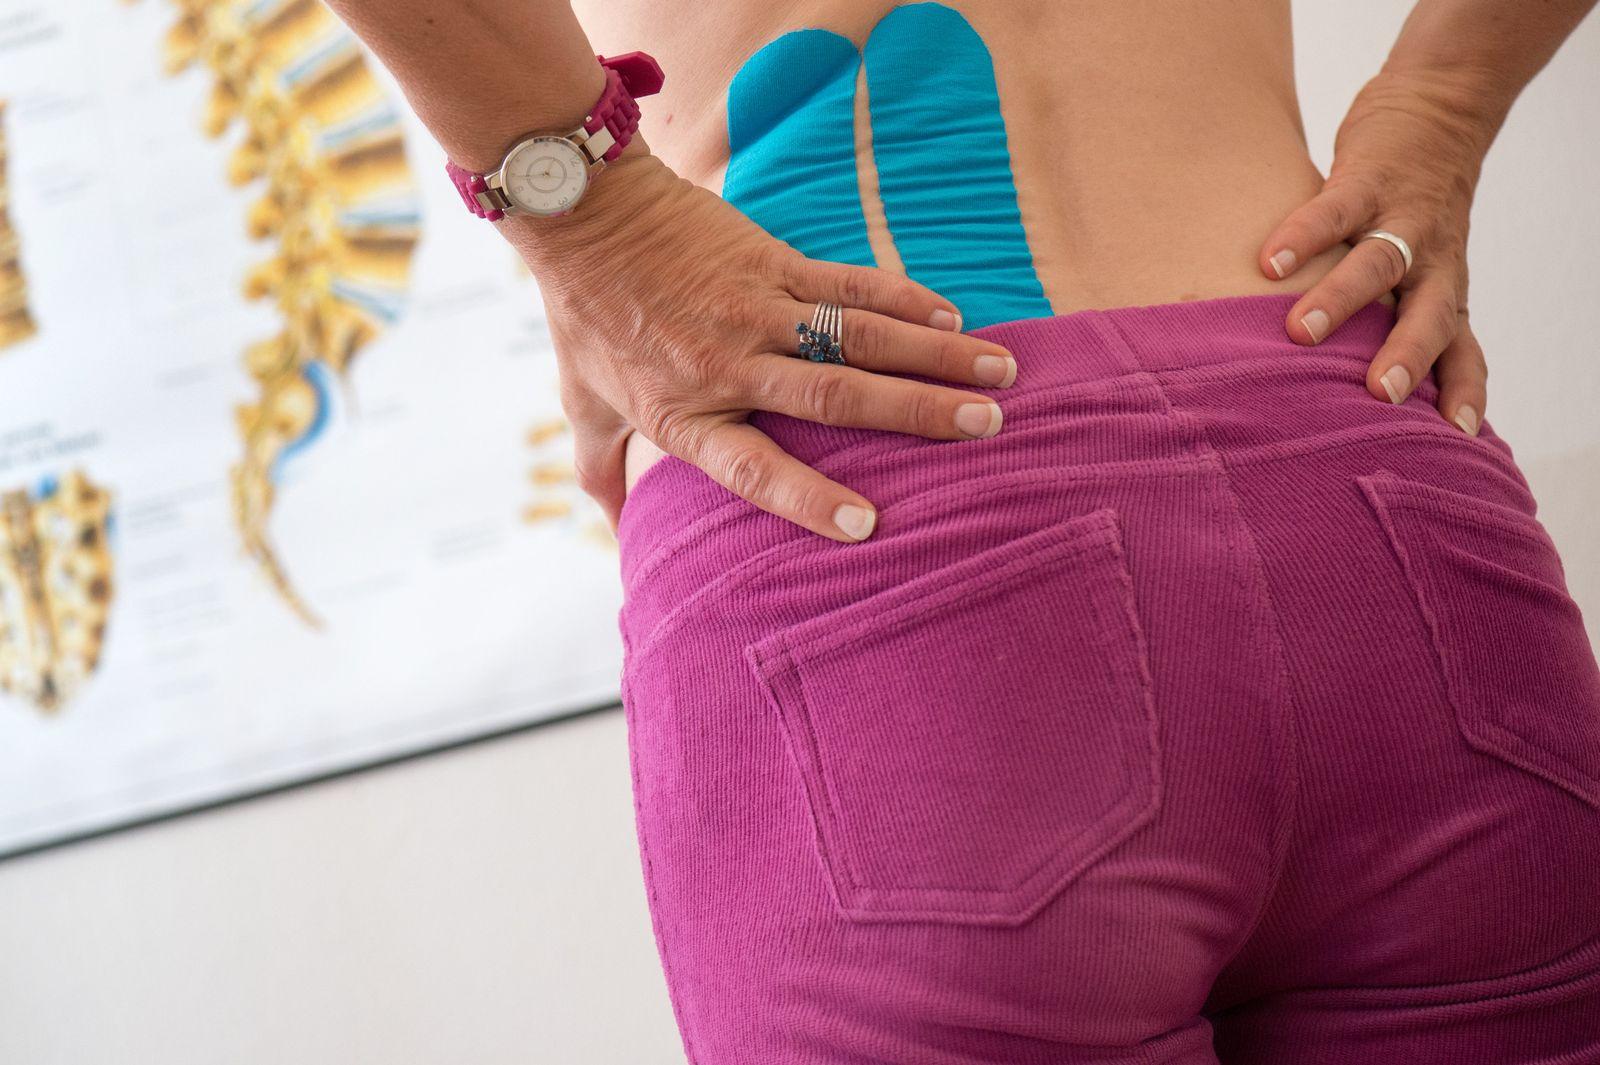 Rückenschmerzen/ Frau/ Stress/ Symbobild